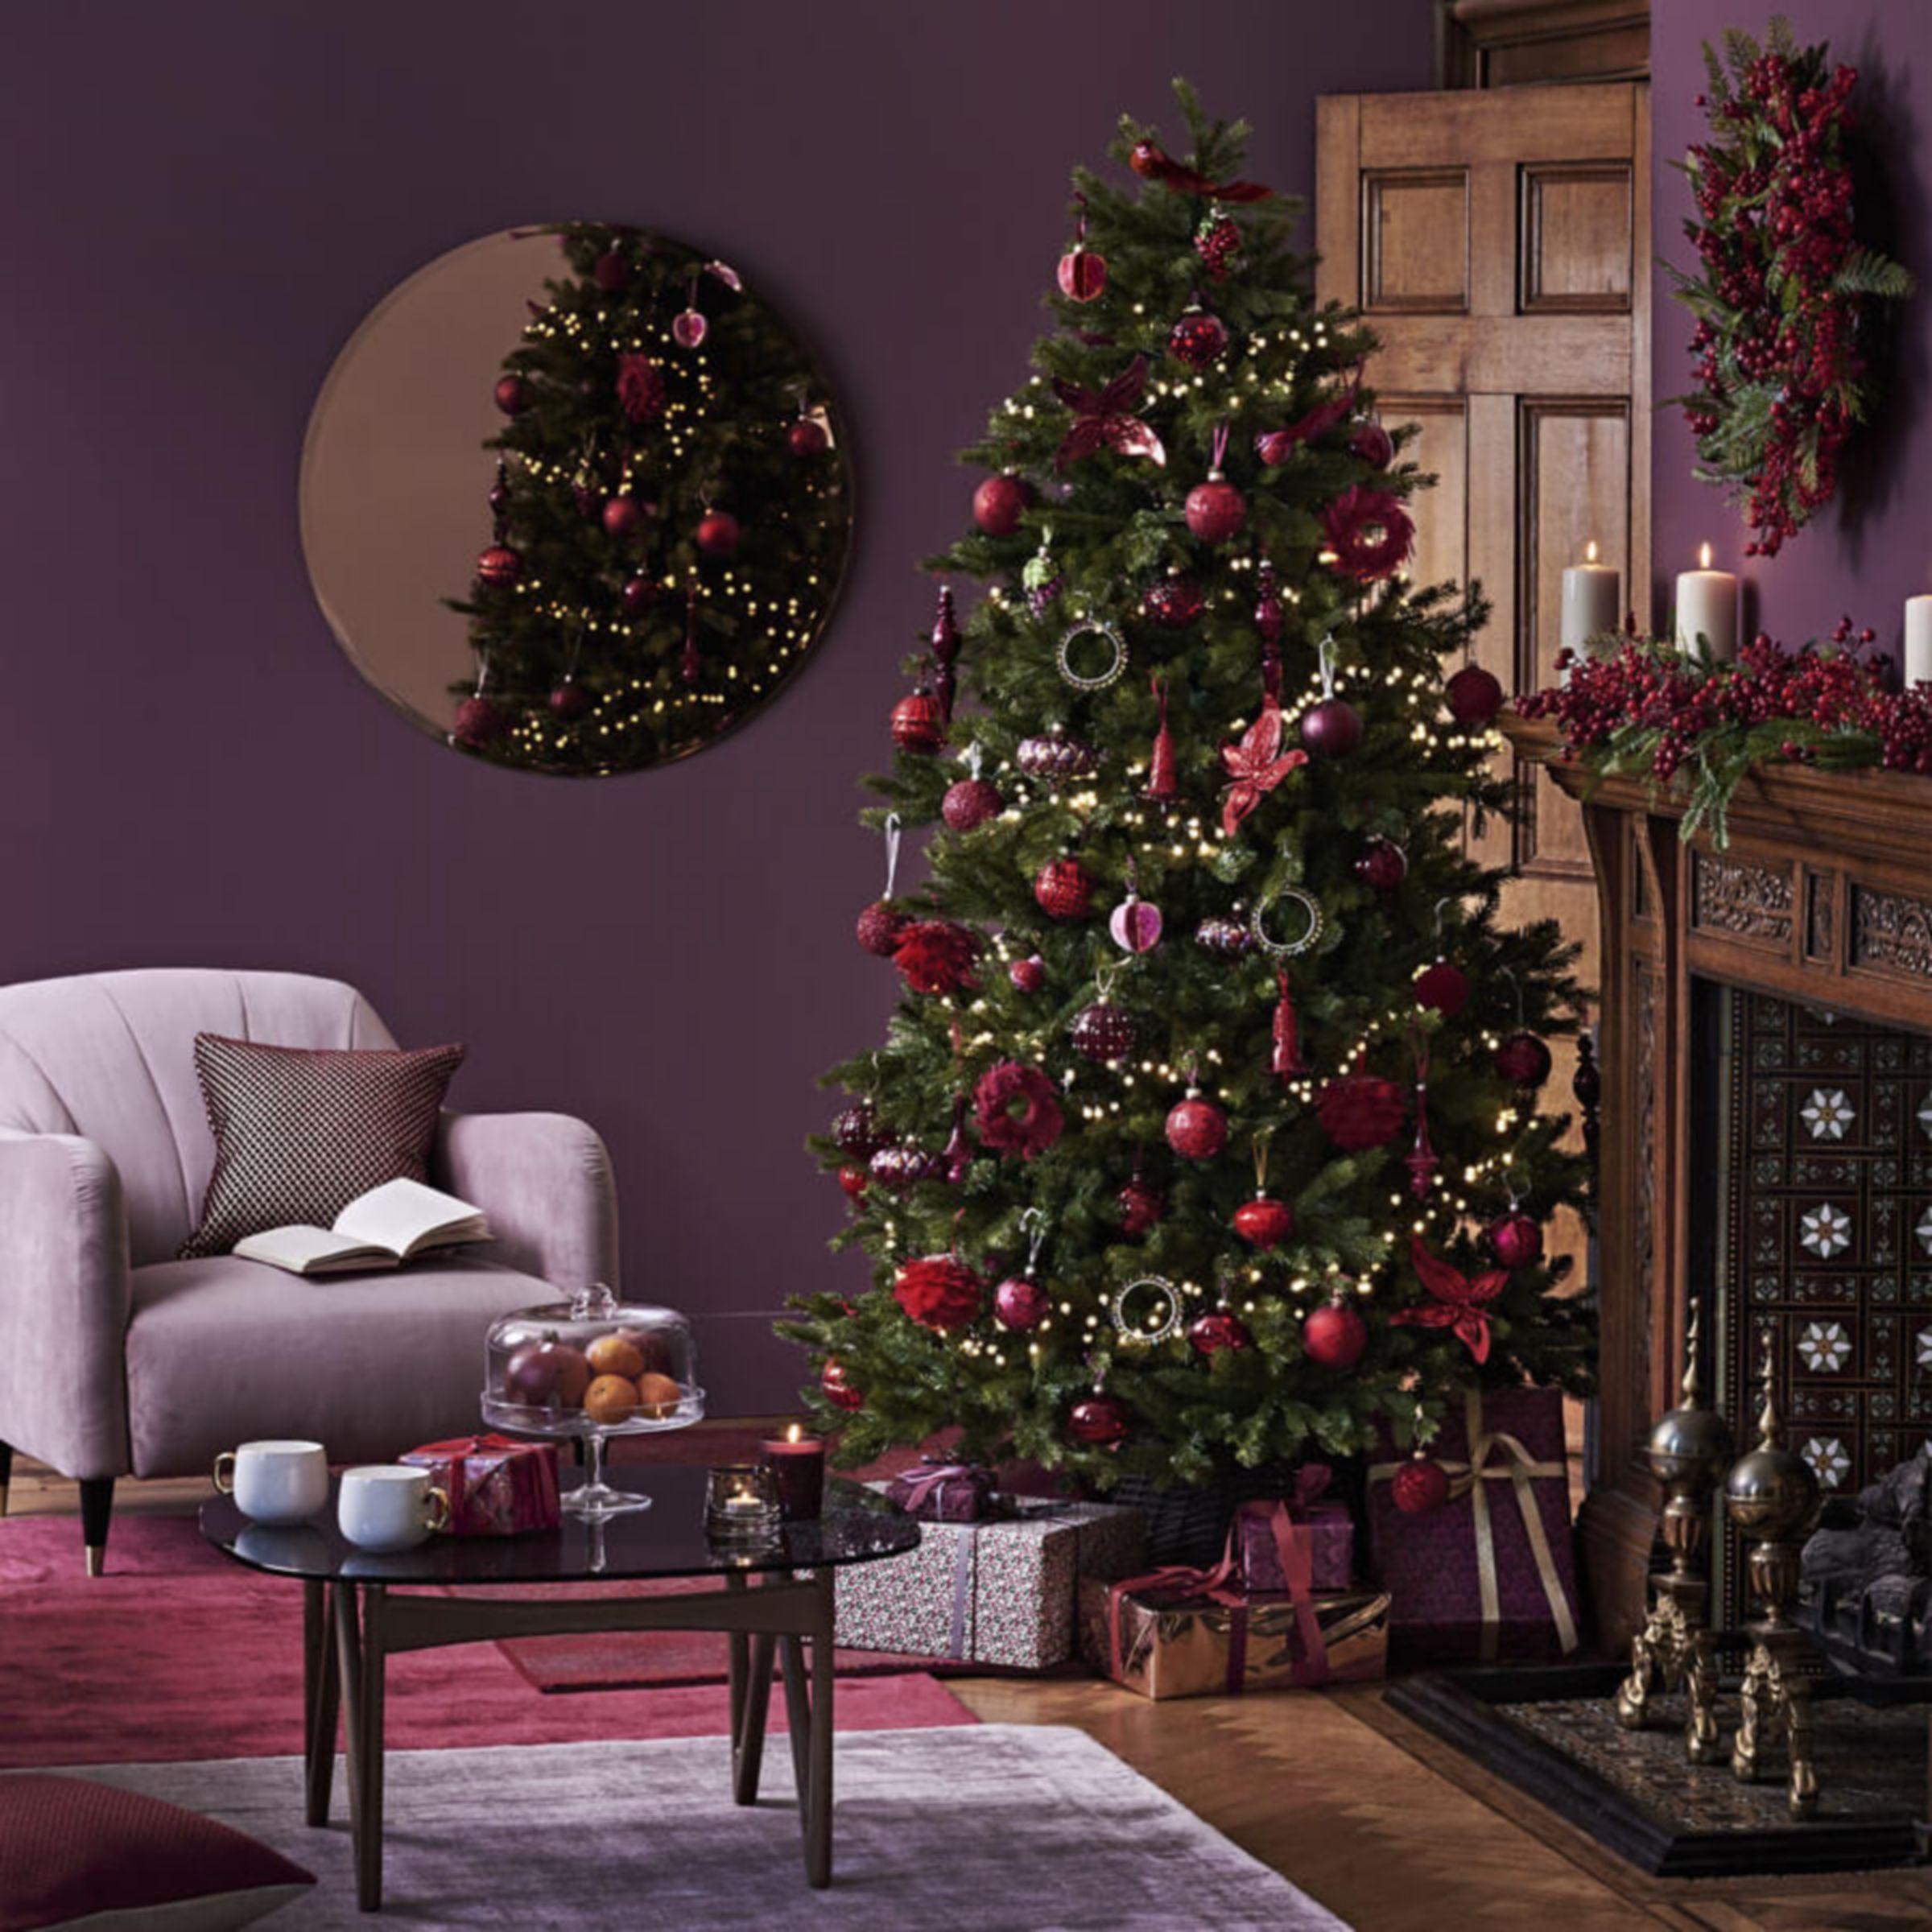 Christmas Christmas Gift Ideas Presents John Lewis Partners Decor Christmas Tree Christmas Gifts